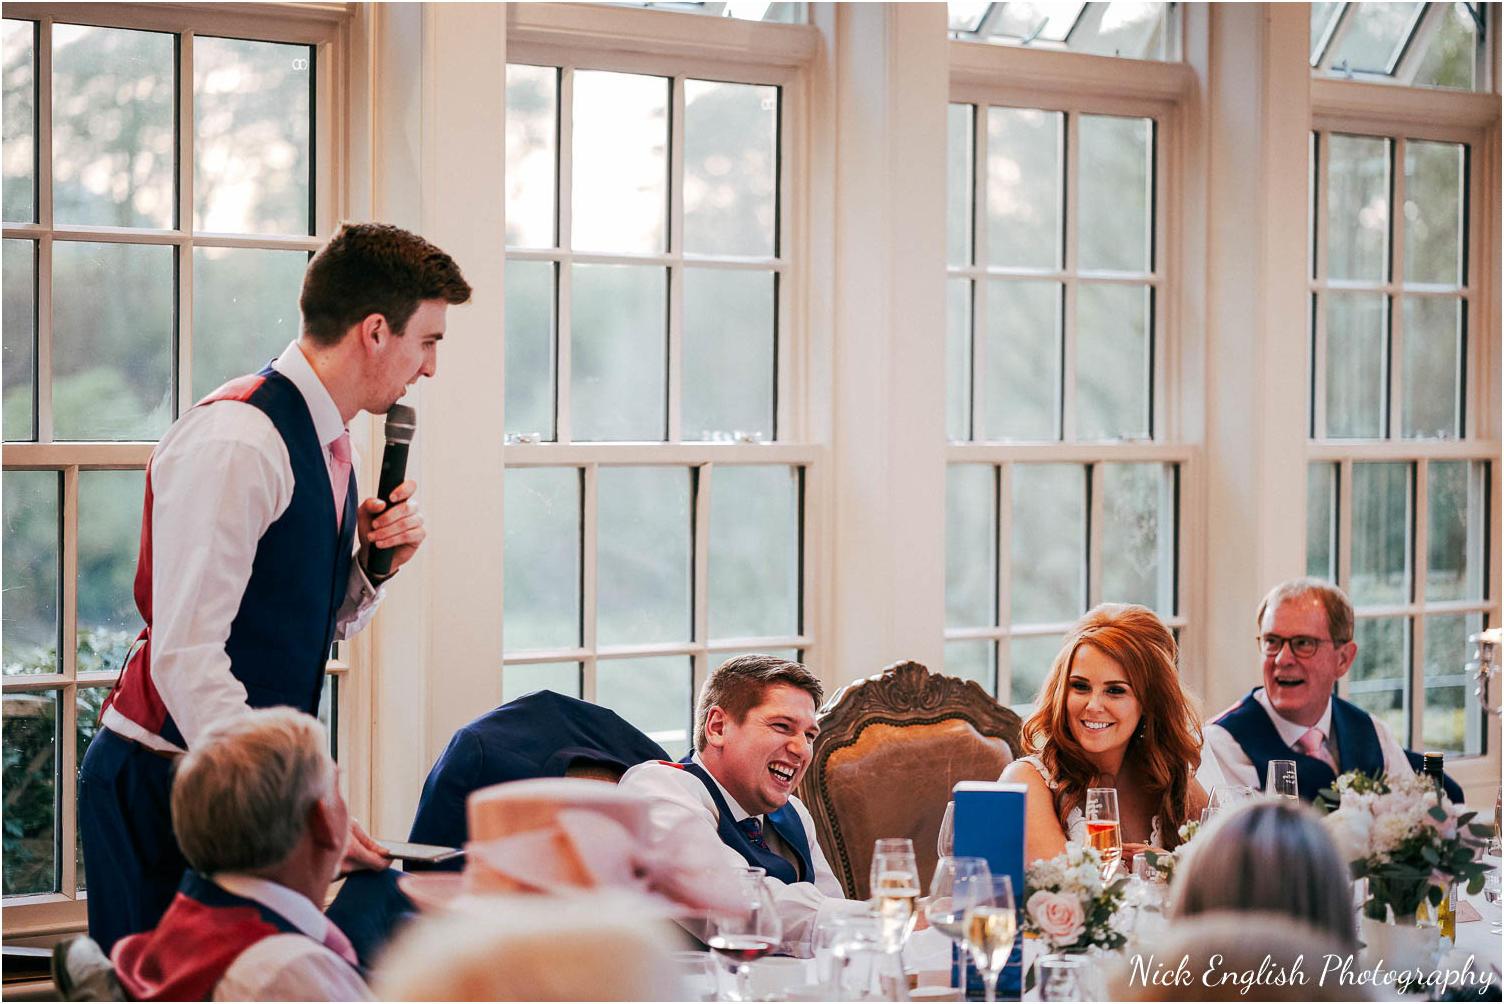 Mitton_Hall_Wedding_Photographer-186.jpg